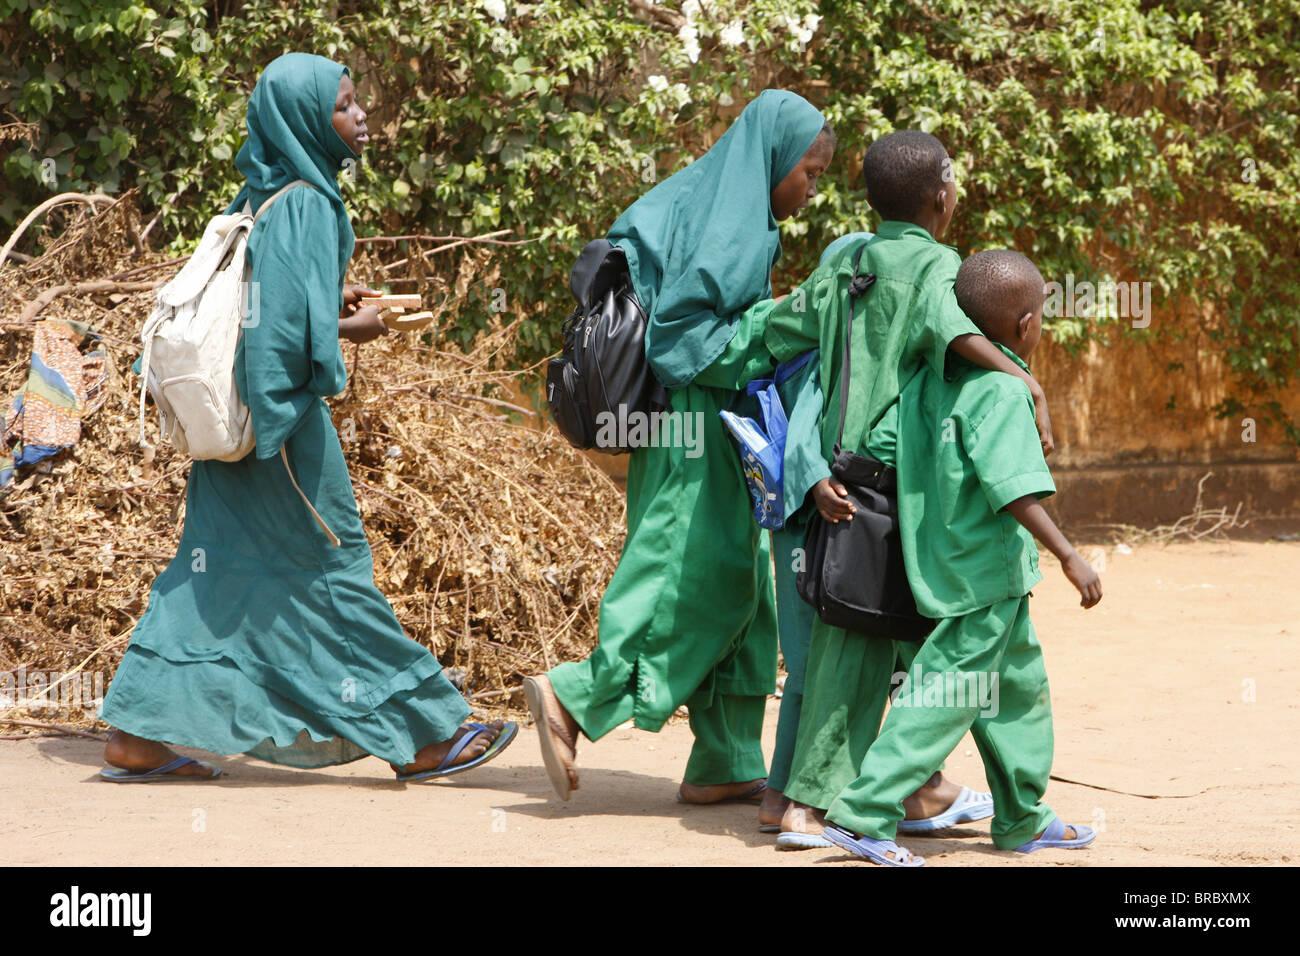 Muslim schoolchildren, Lome, Togo, West Africa - Stock Image